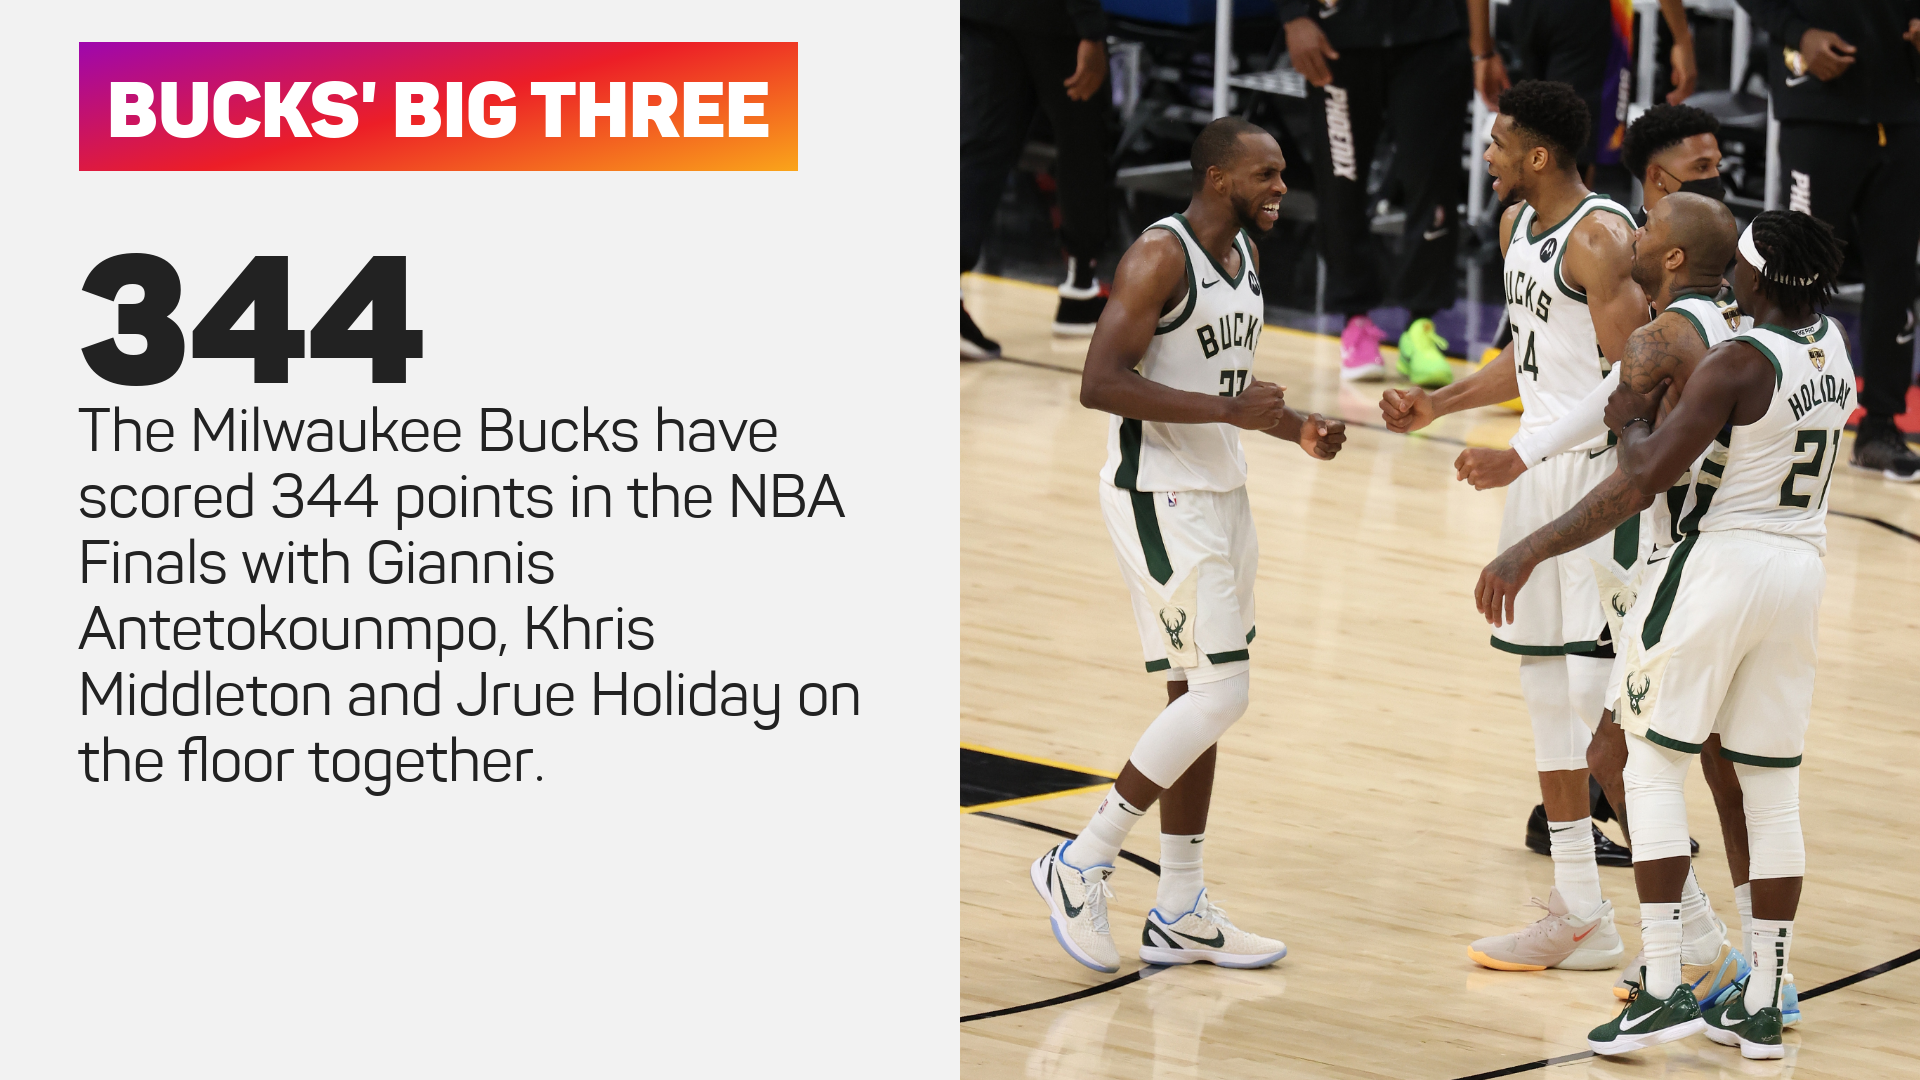 Bucks big three